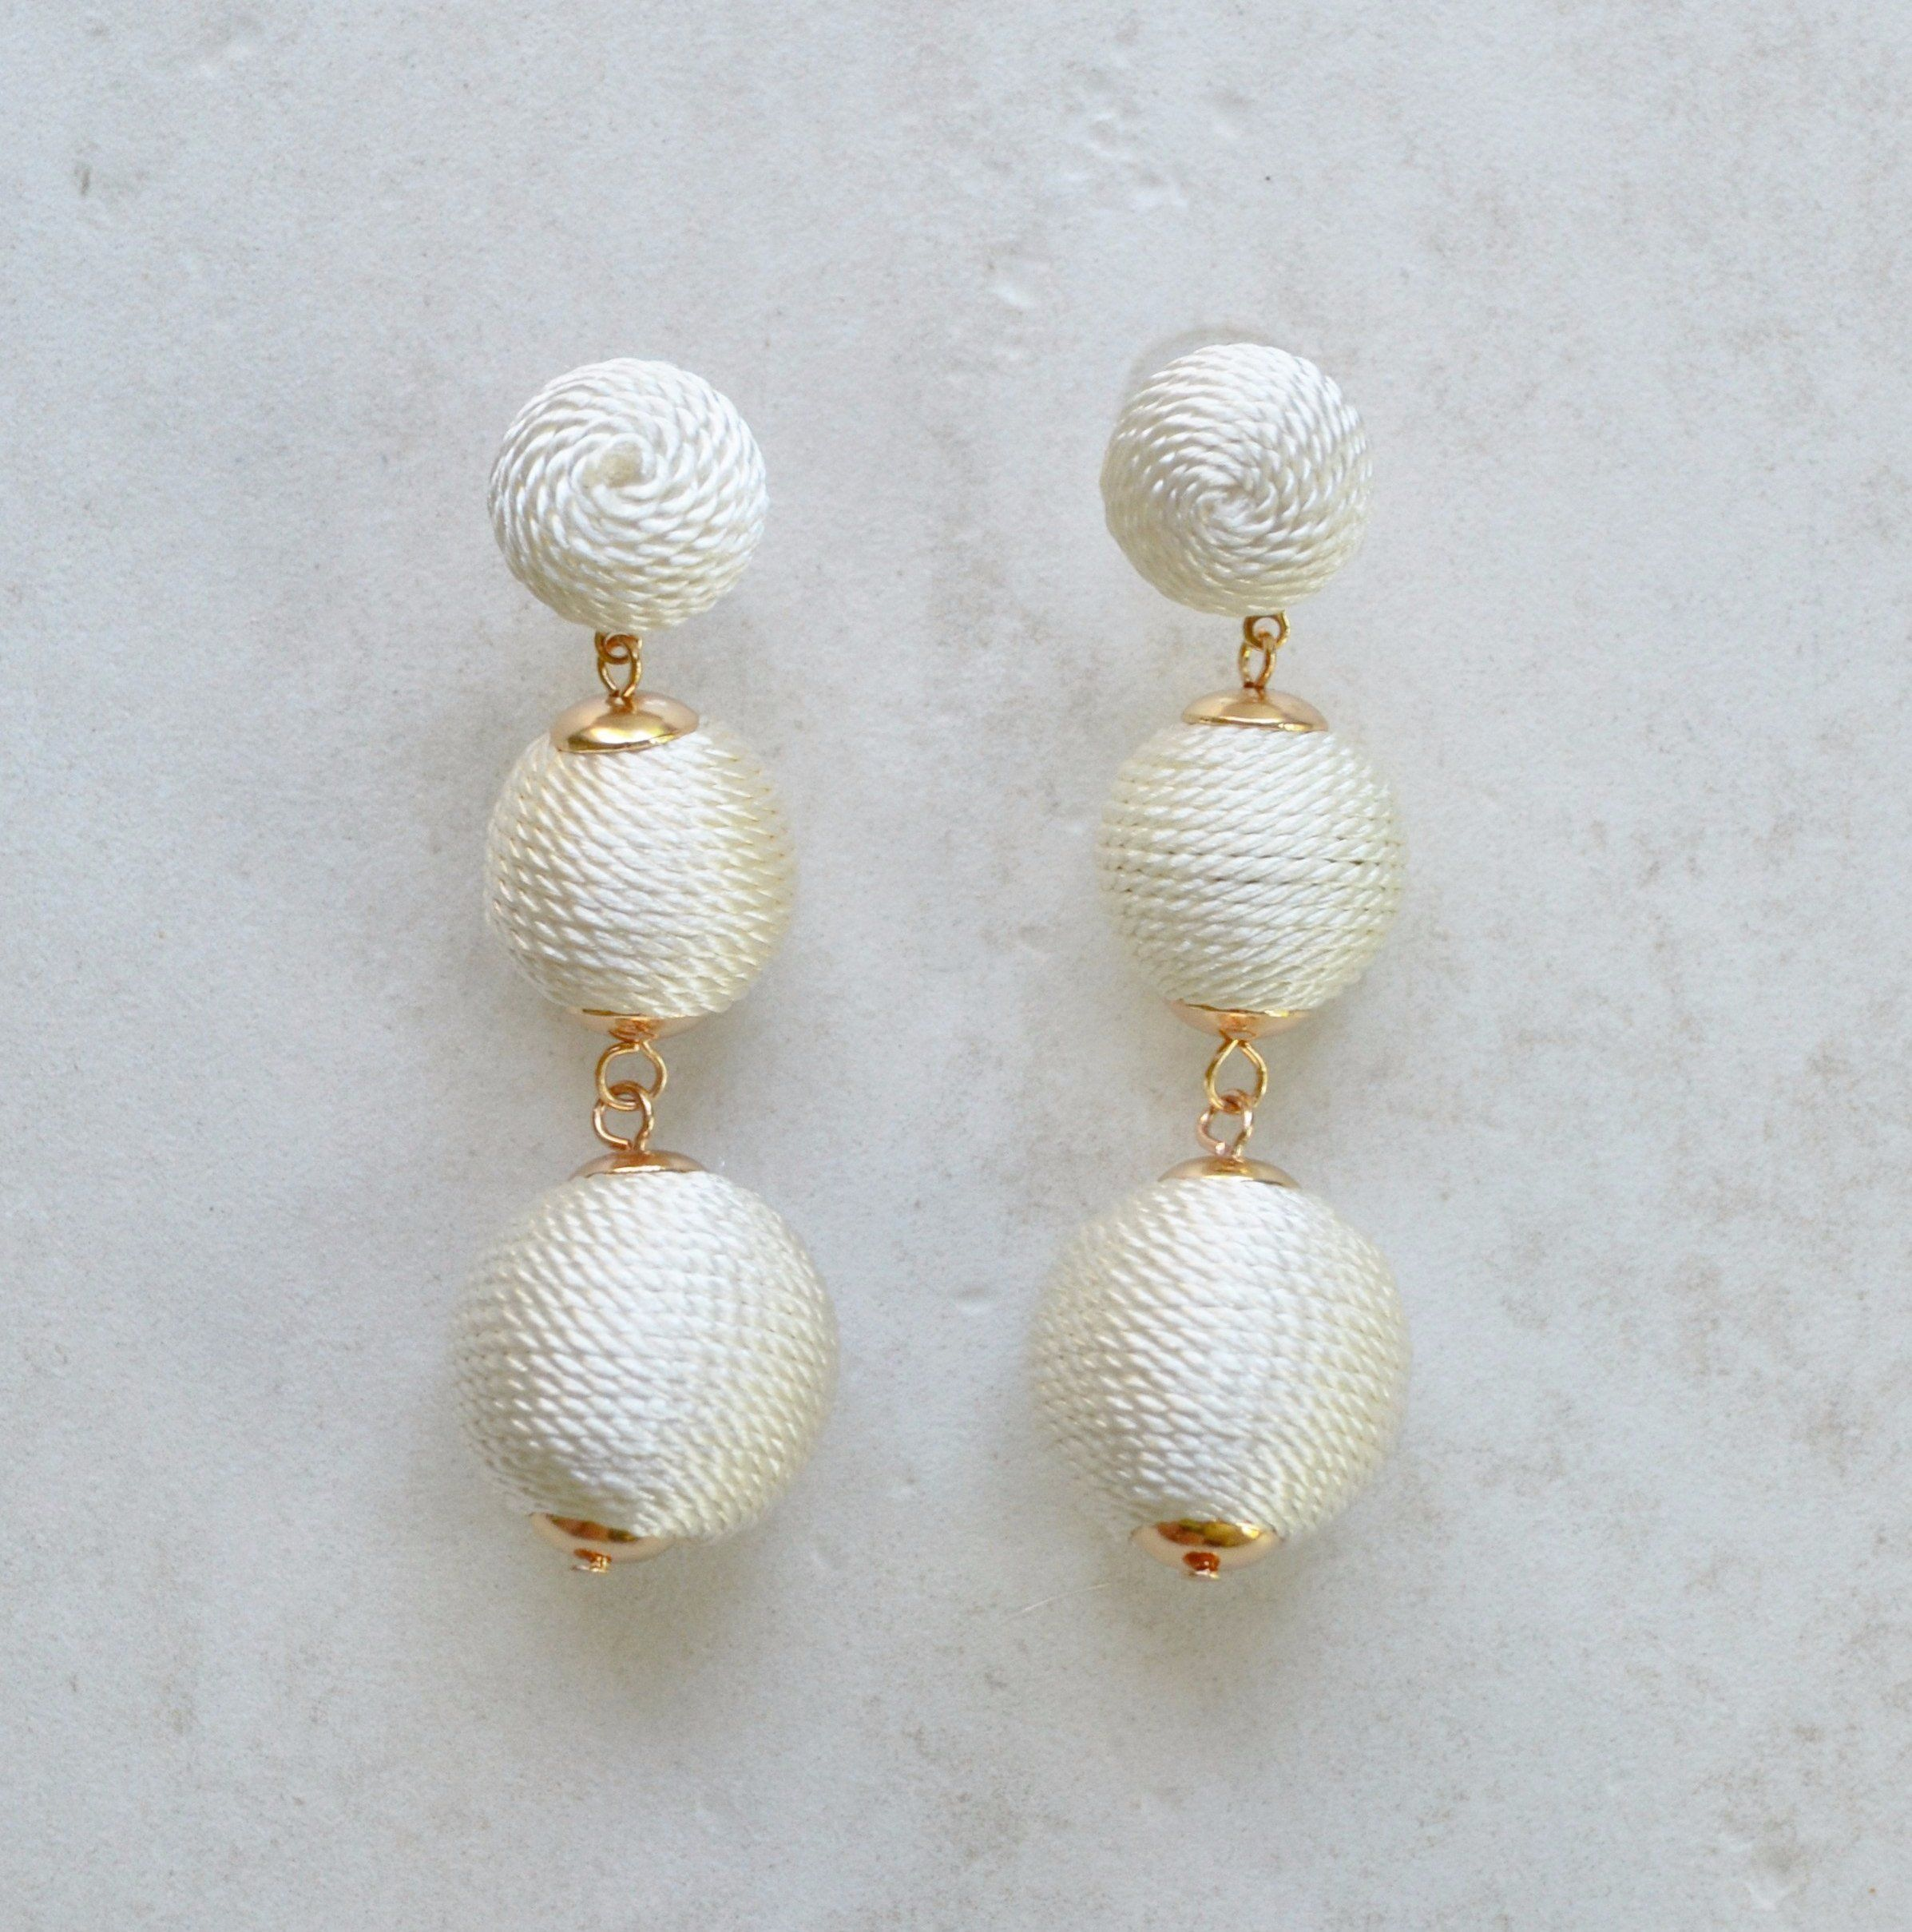 Dreaming Big Earrings (White-Small)